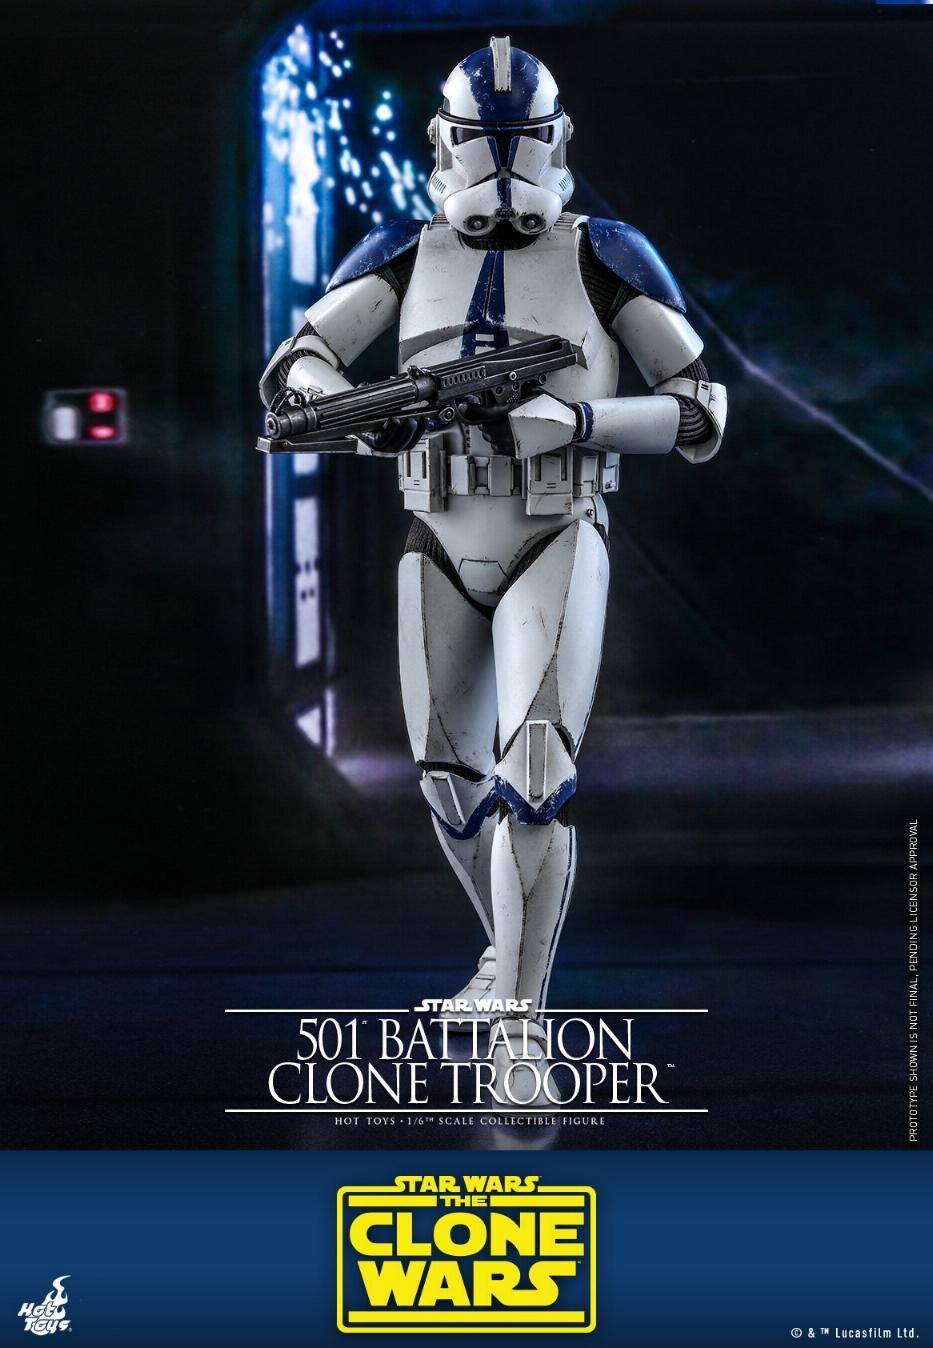 501st Battalion Clone Trooper - The Clone Wars - Hot Toys 0536